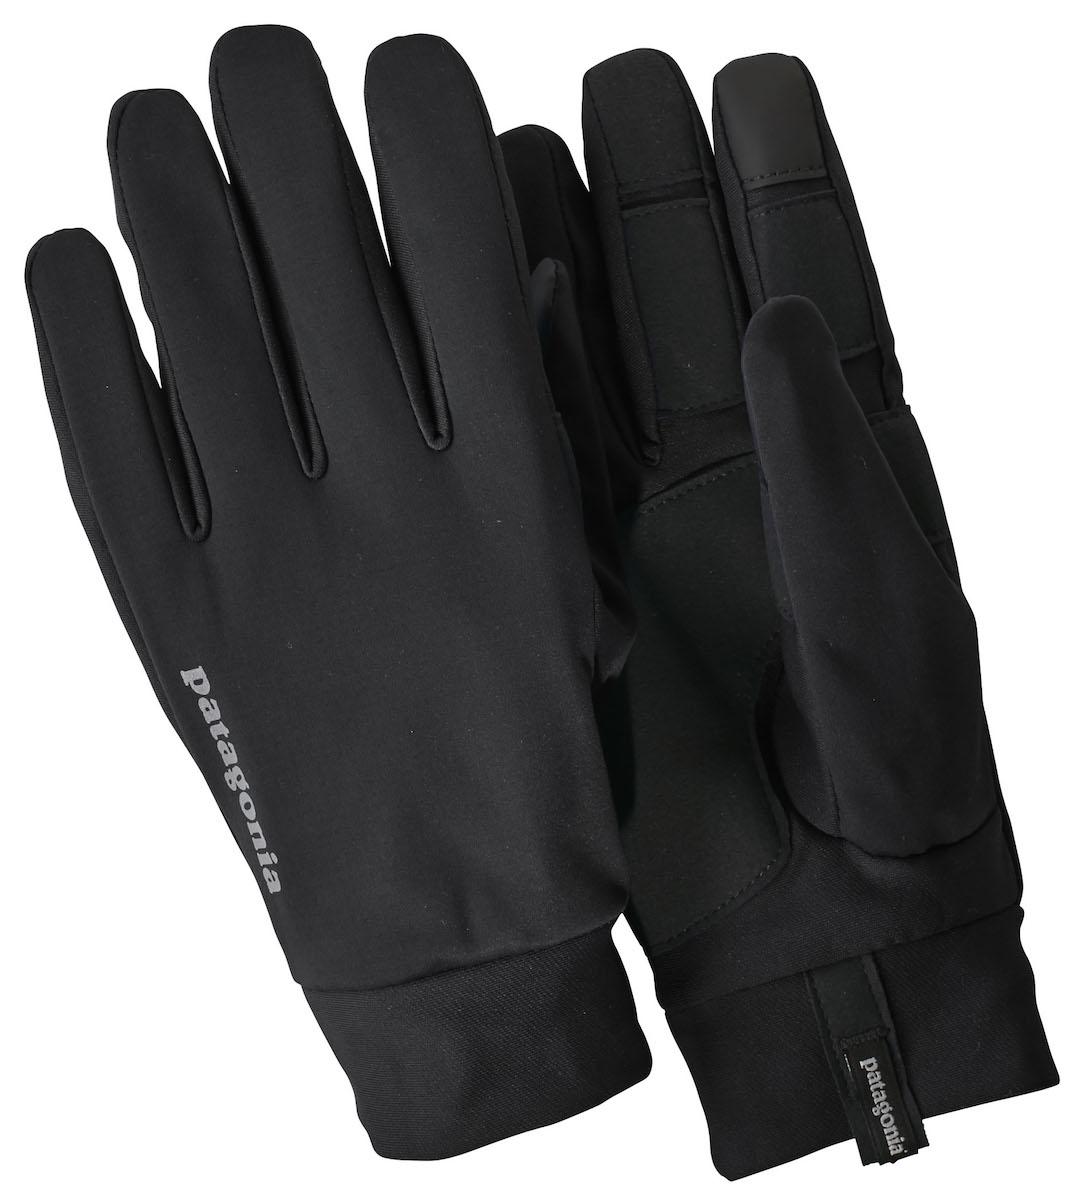 Patagonia - Wind Shield Gloves - Running gloves